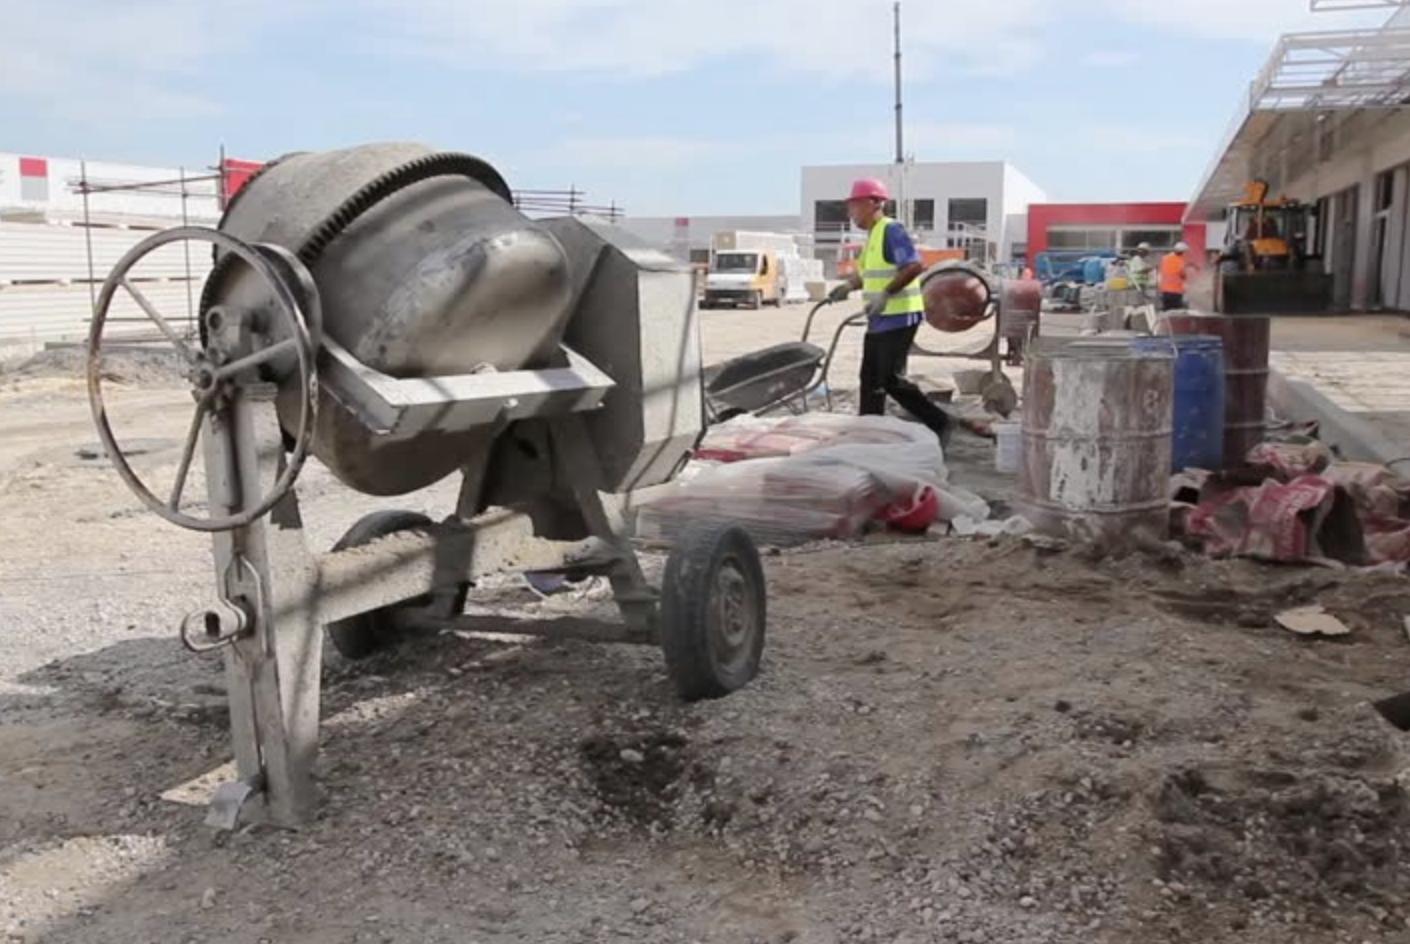 revolvedora de concreto trompo mezacladora cemento 2 sacos renta monterrey rompedoras y compactadora